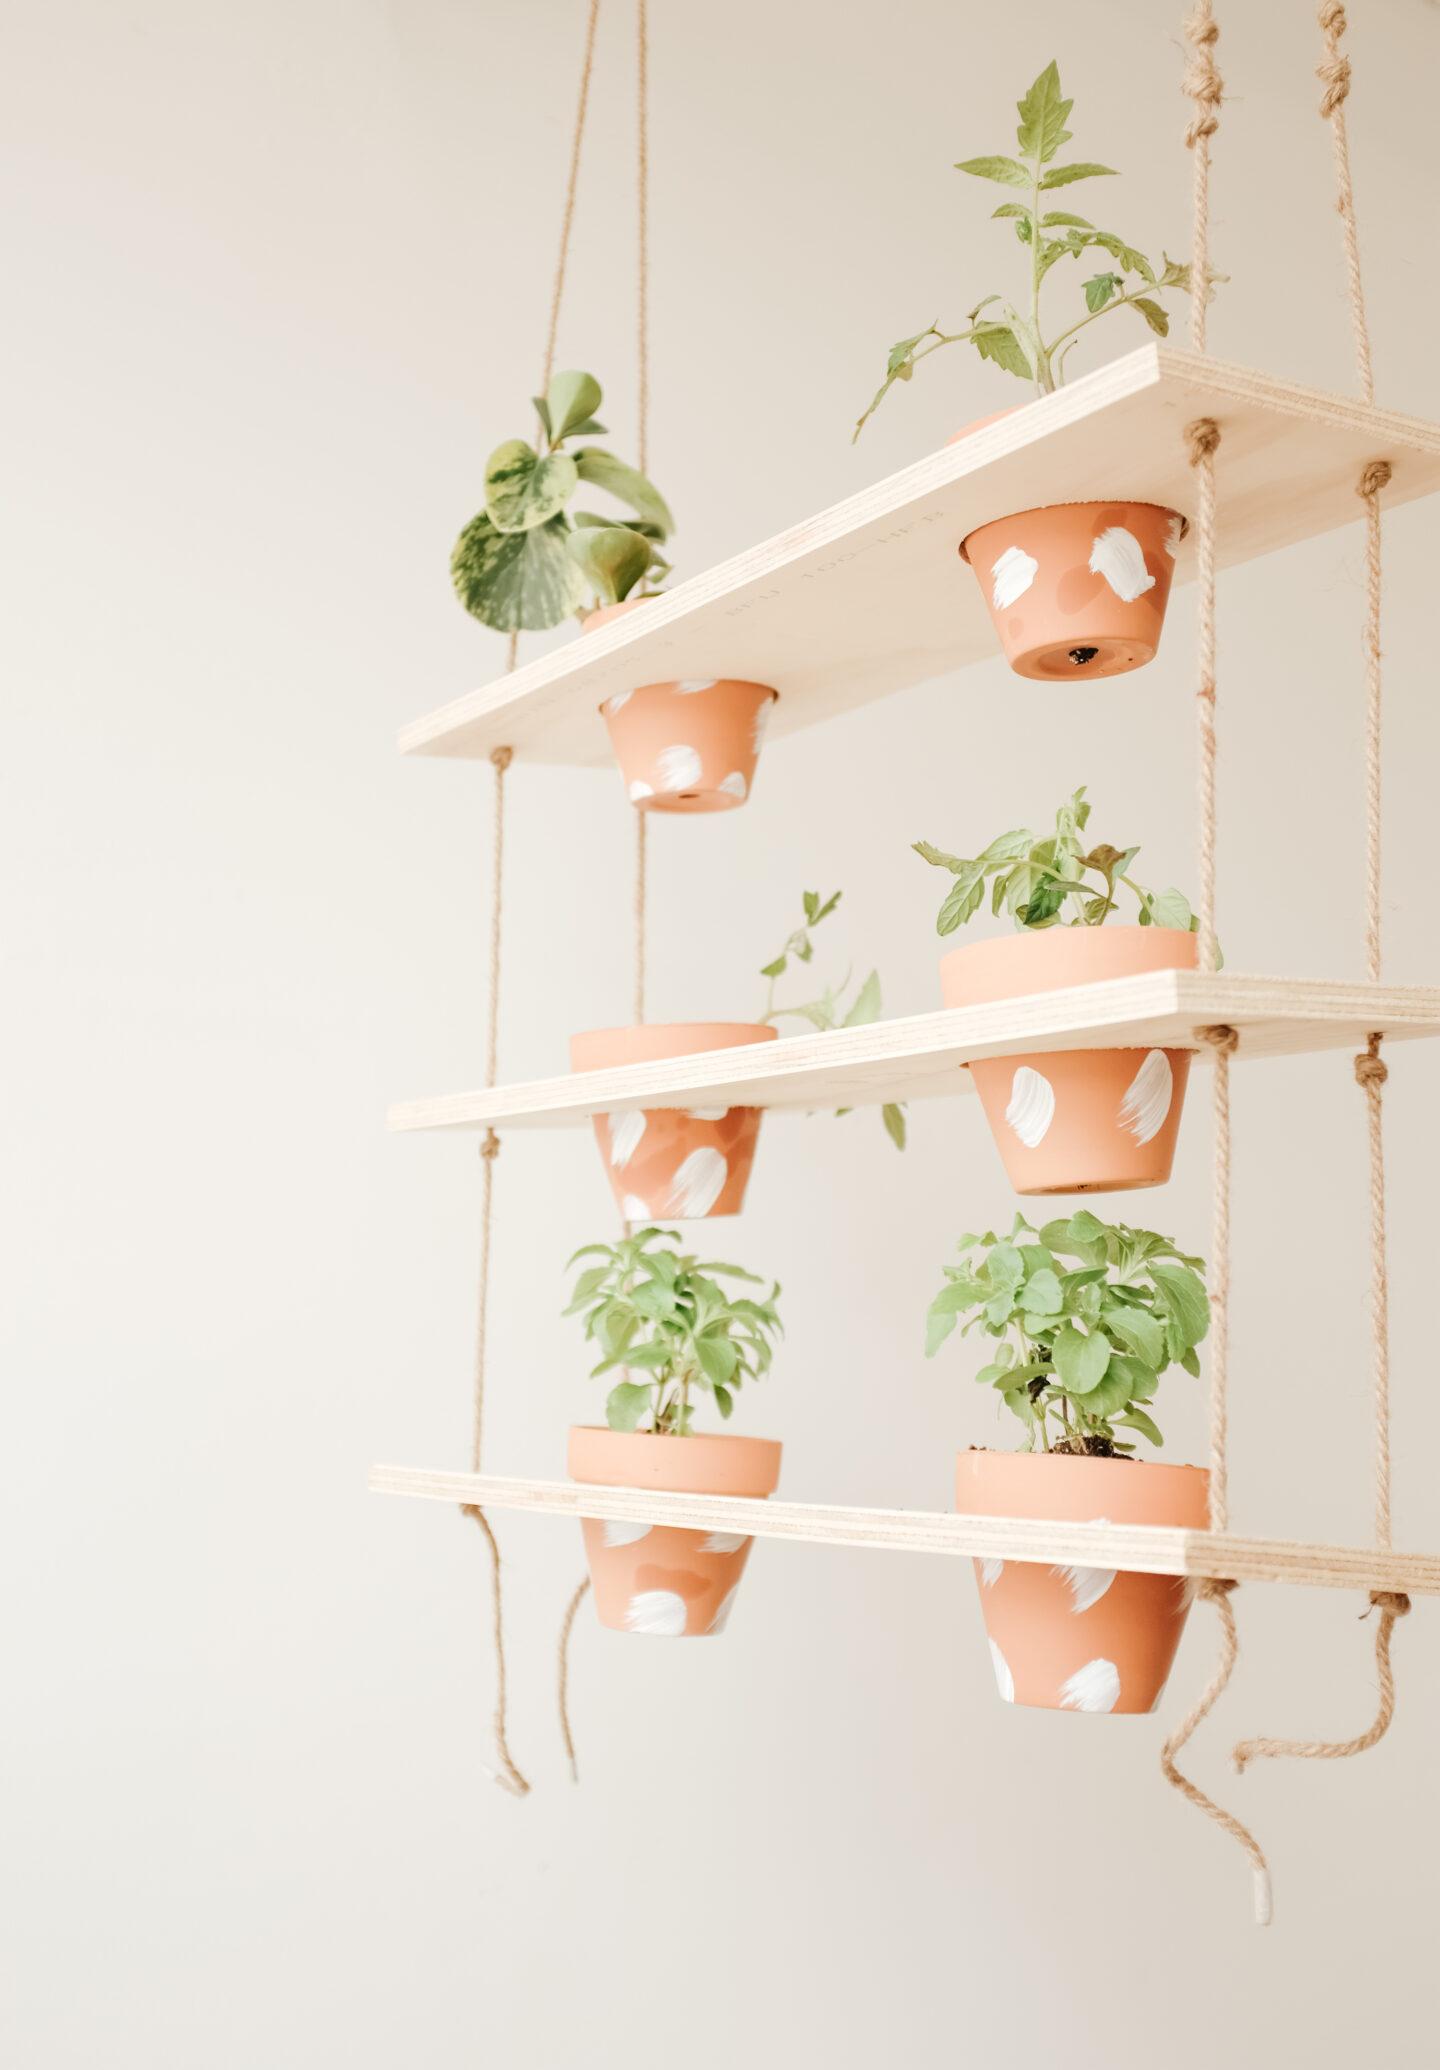 Vertical garden DIY project